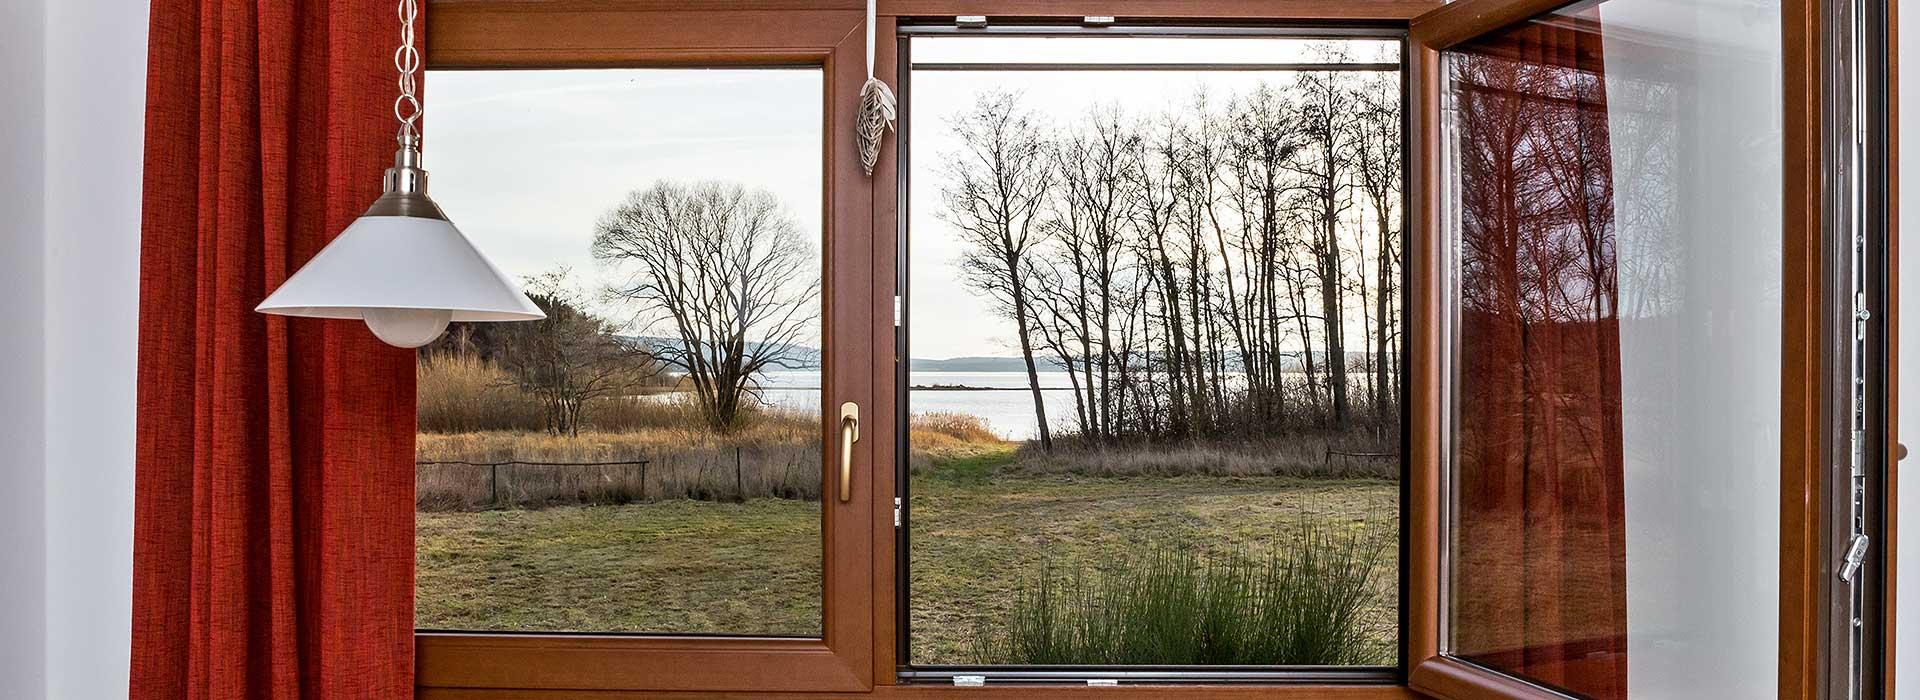 Lipno Mobile Home Hůrka - výhled z okna